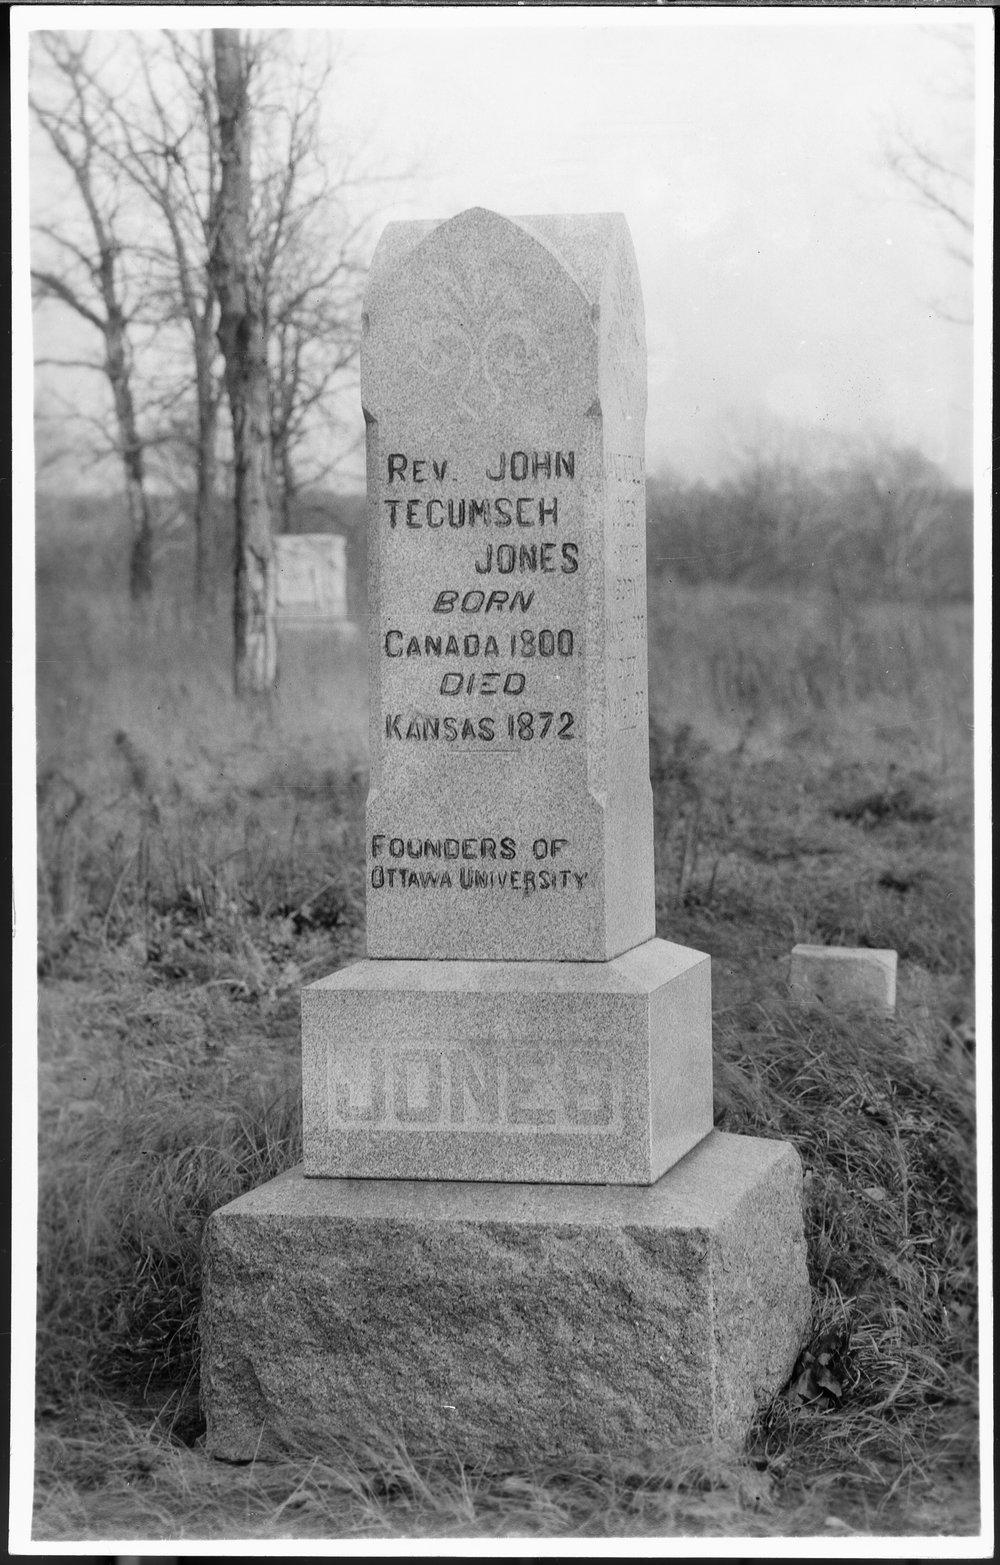 Rev. John Tecumseh Jones and Jane Kelly Jones gravesite - Photo #16 is on a postcard.  It is of the monument of Rev. John Tecumseh Jones.